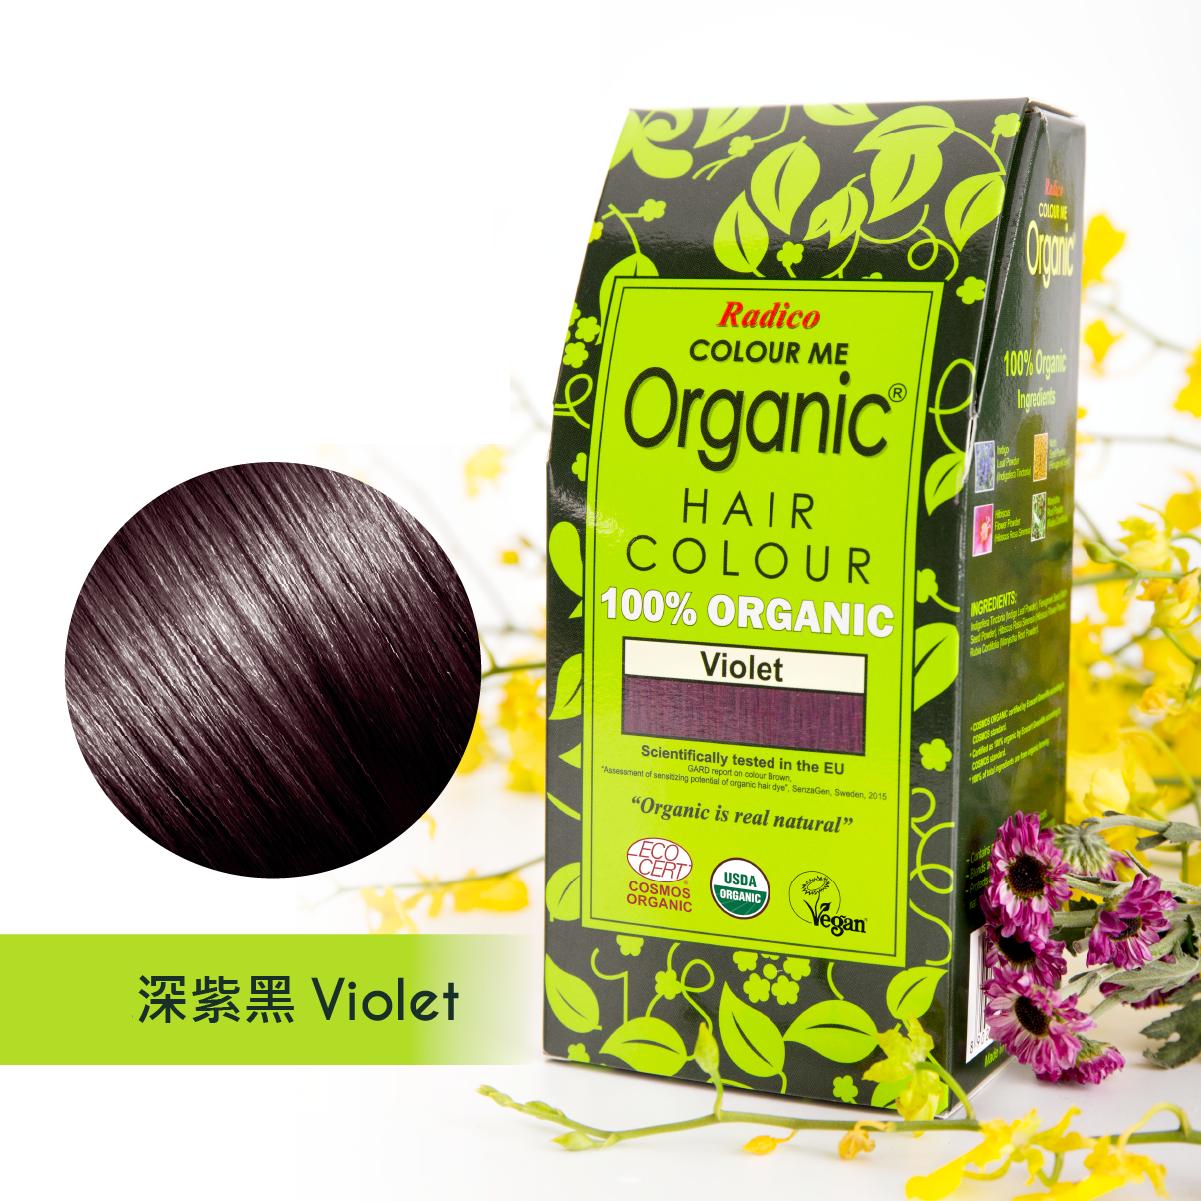 Radico Organic Hair Colour - Violet